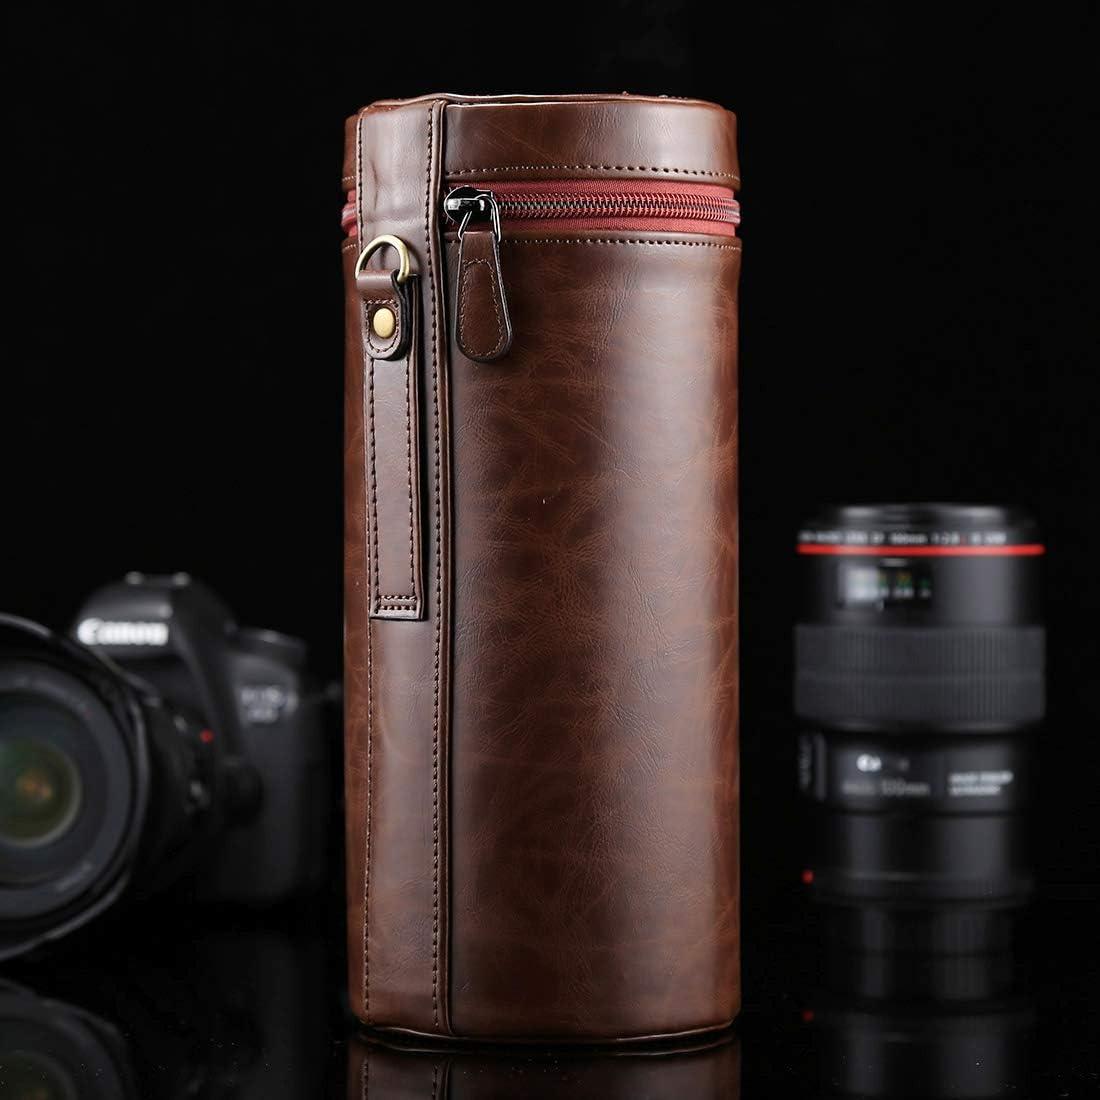 ZHANGJIALI Jiali Bargain Opening large release sale Camera Bag Protectiv Waterproof Lens